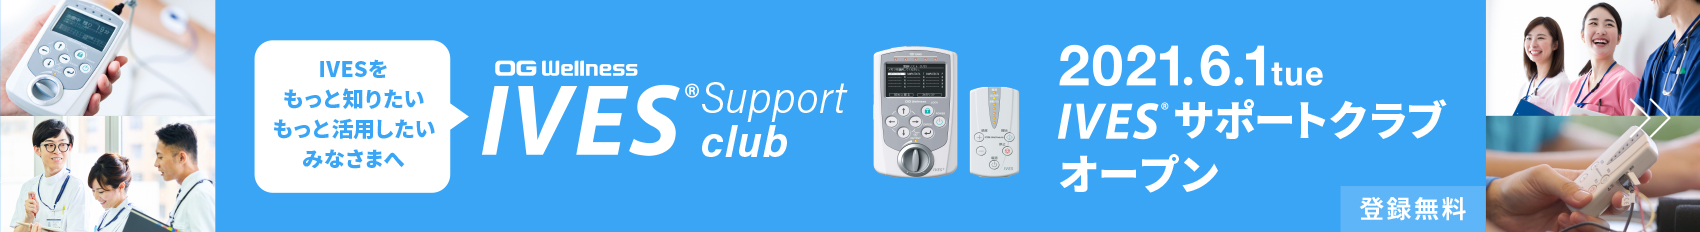 IVESサポートクラブ